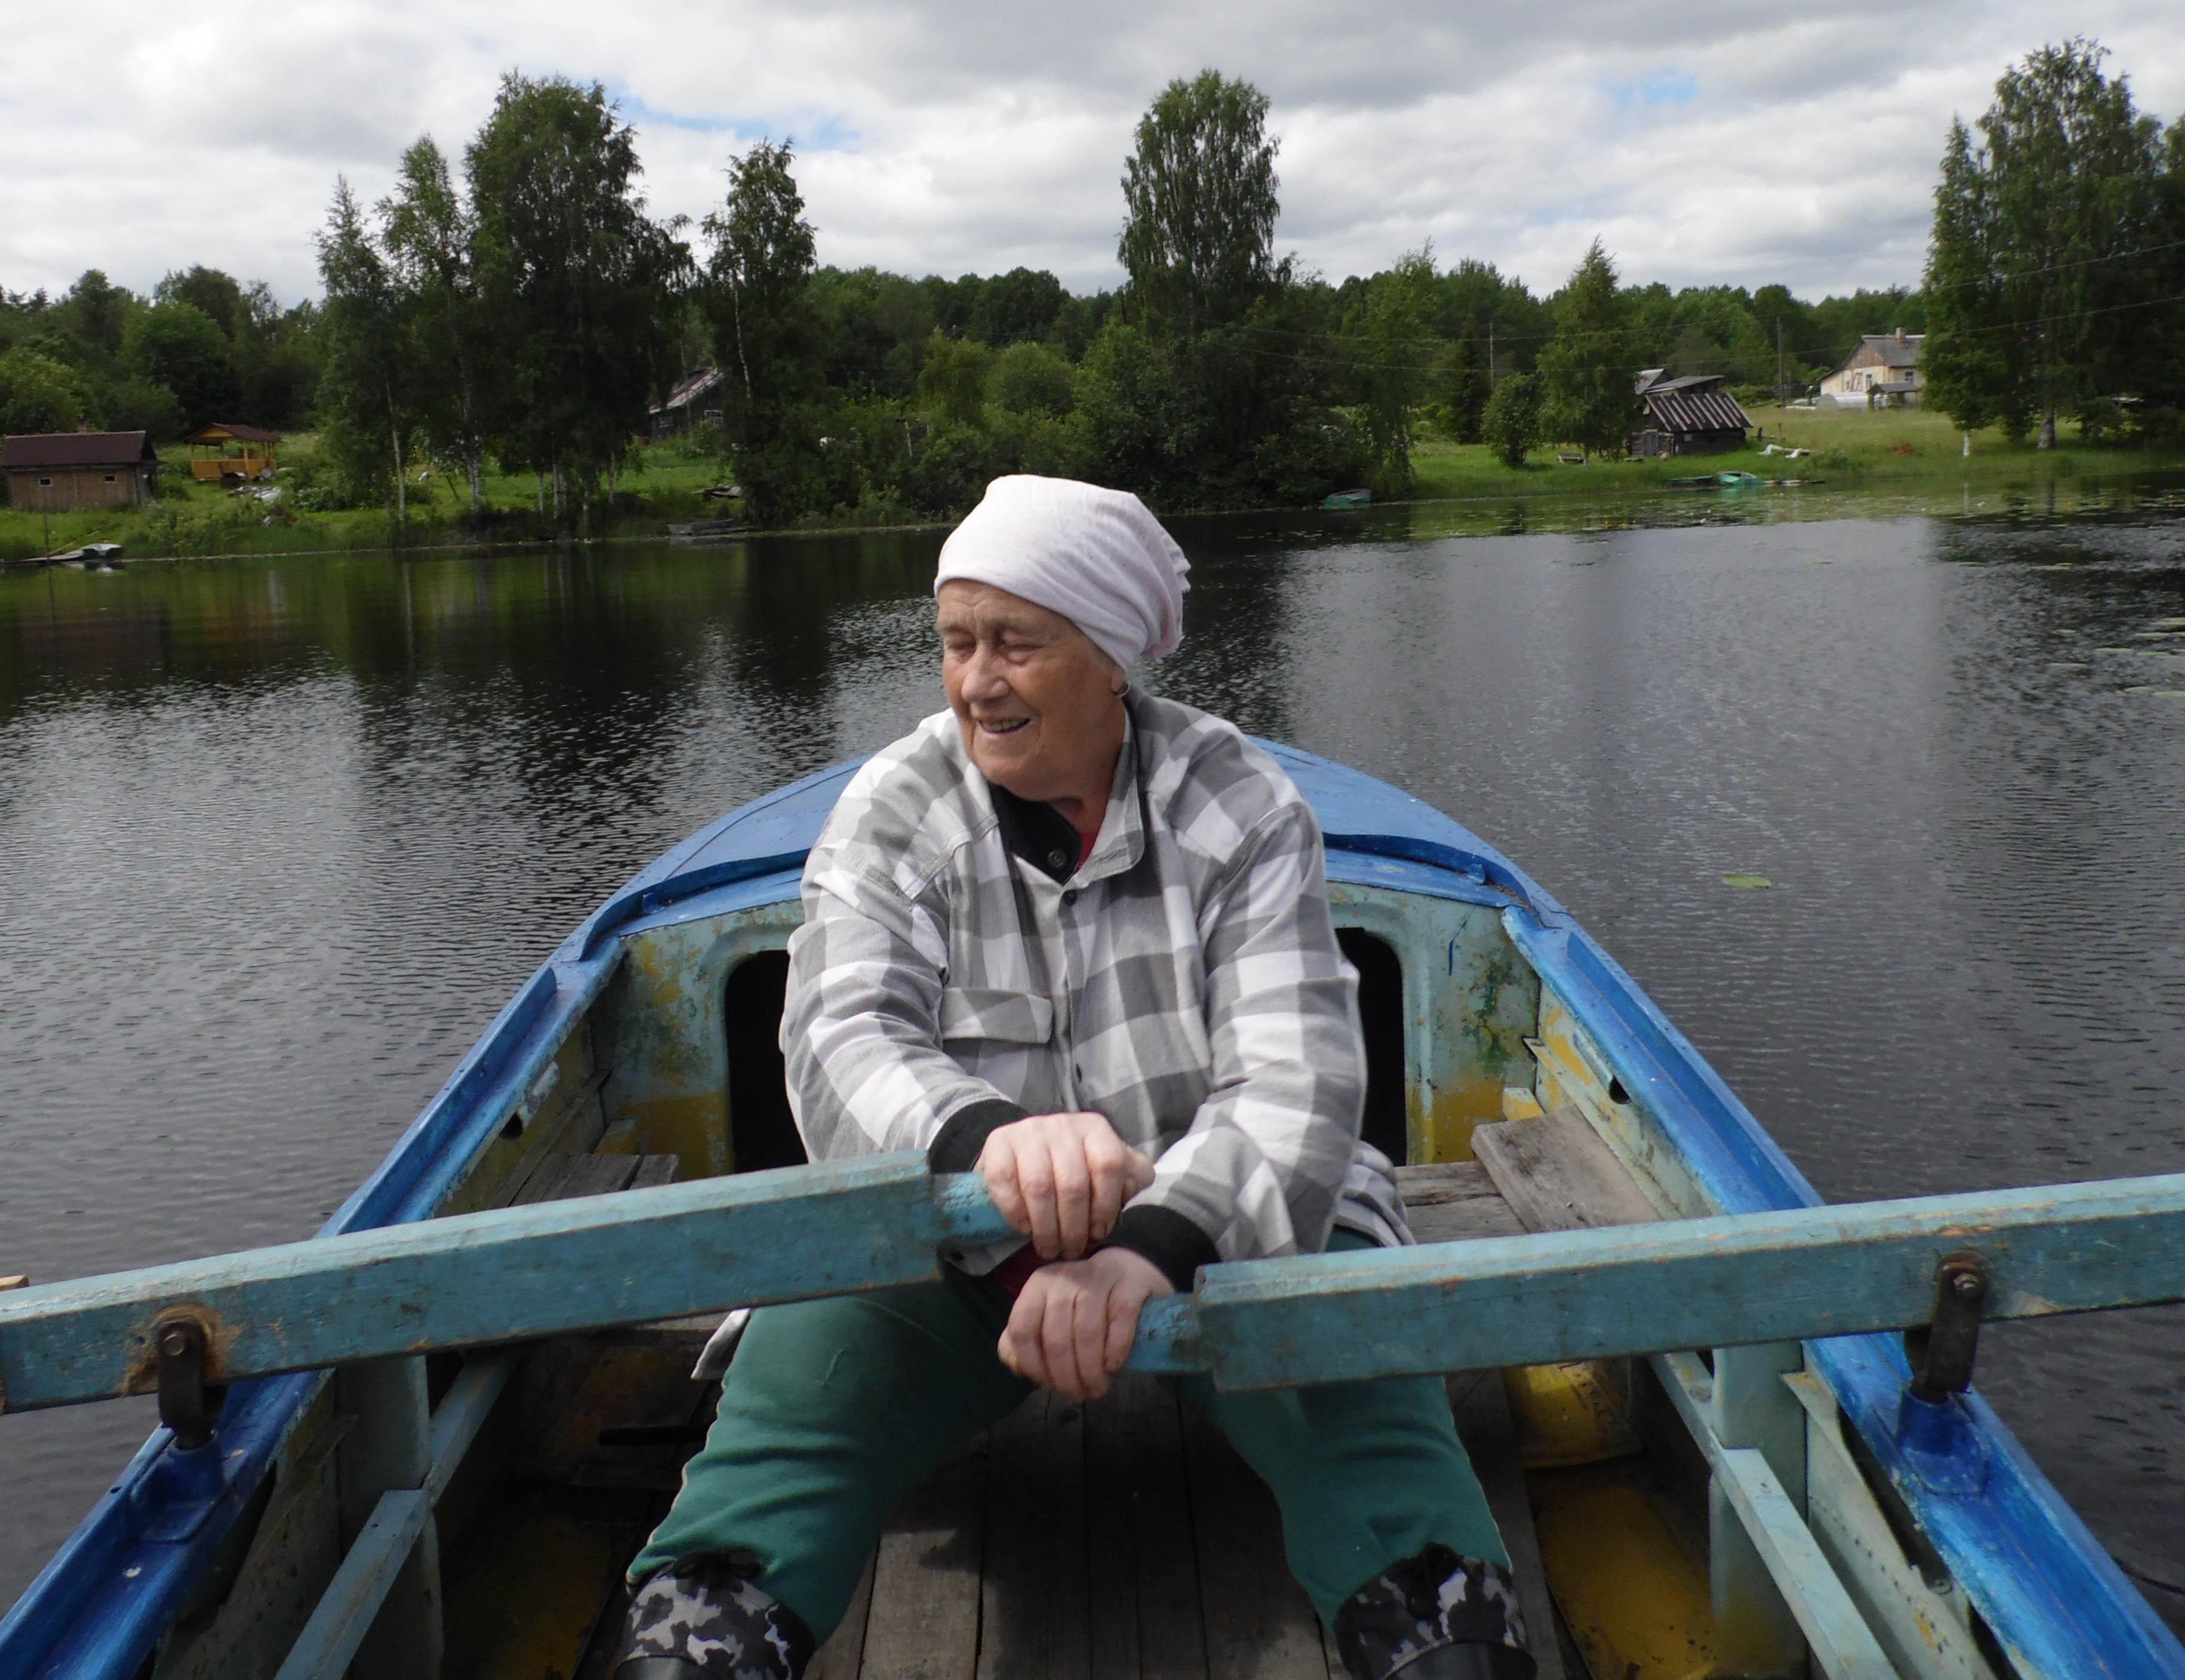 Галина Мушникова. Фото: Алексей Владимиров